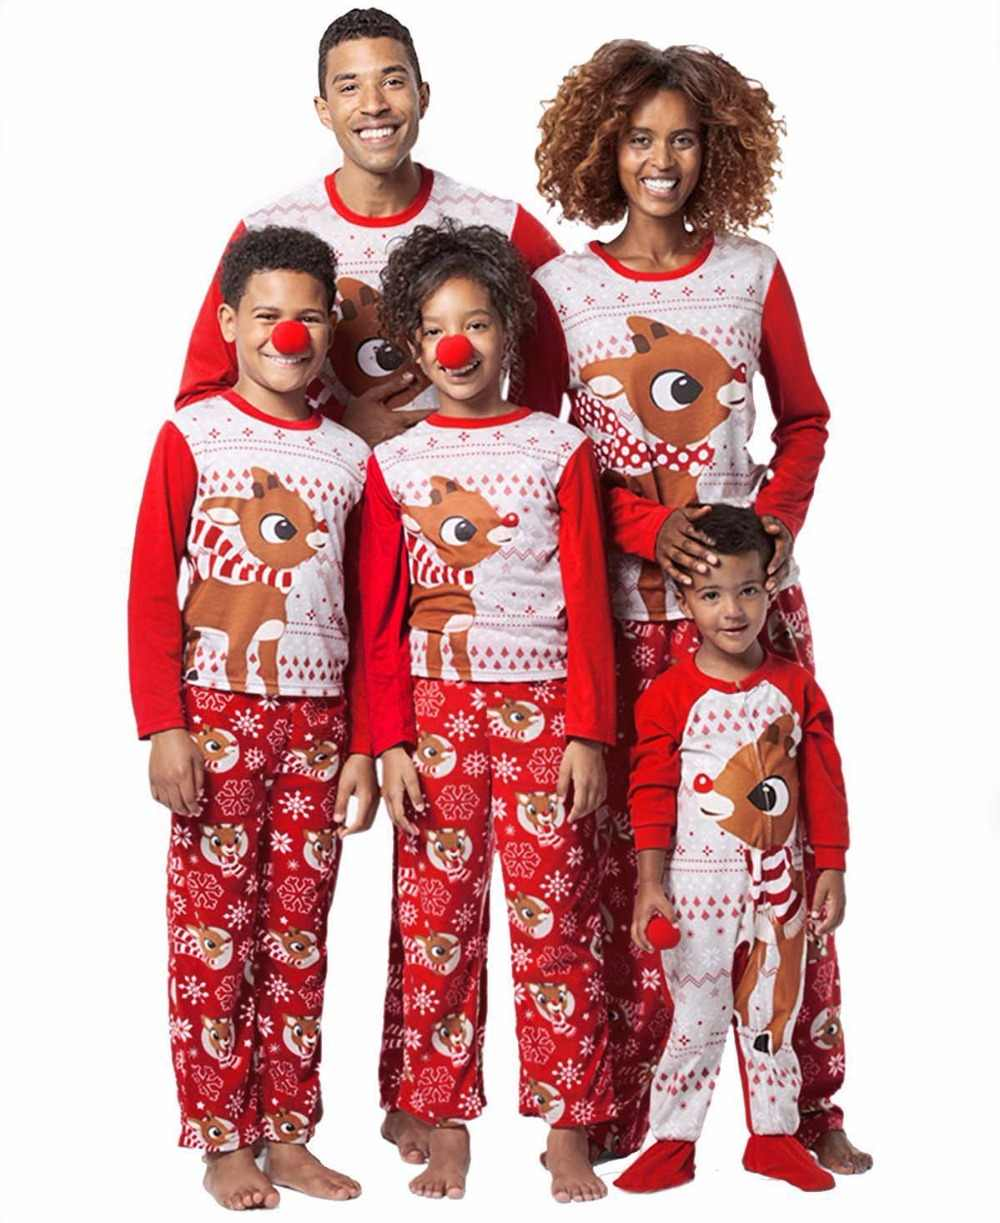 Family Christmas Pajamas Set  Moose Adult Women Kids New 2017 Christmas Deer Nightwear Pyjamas Matching Family Outfits